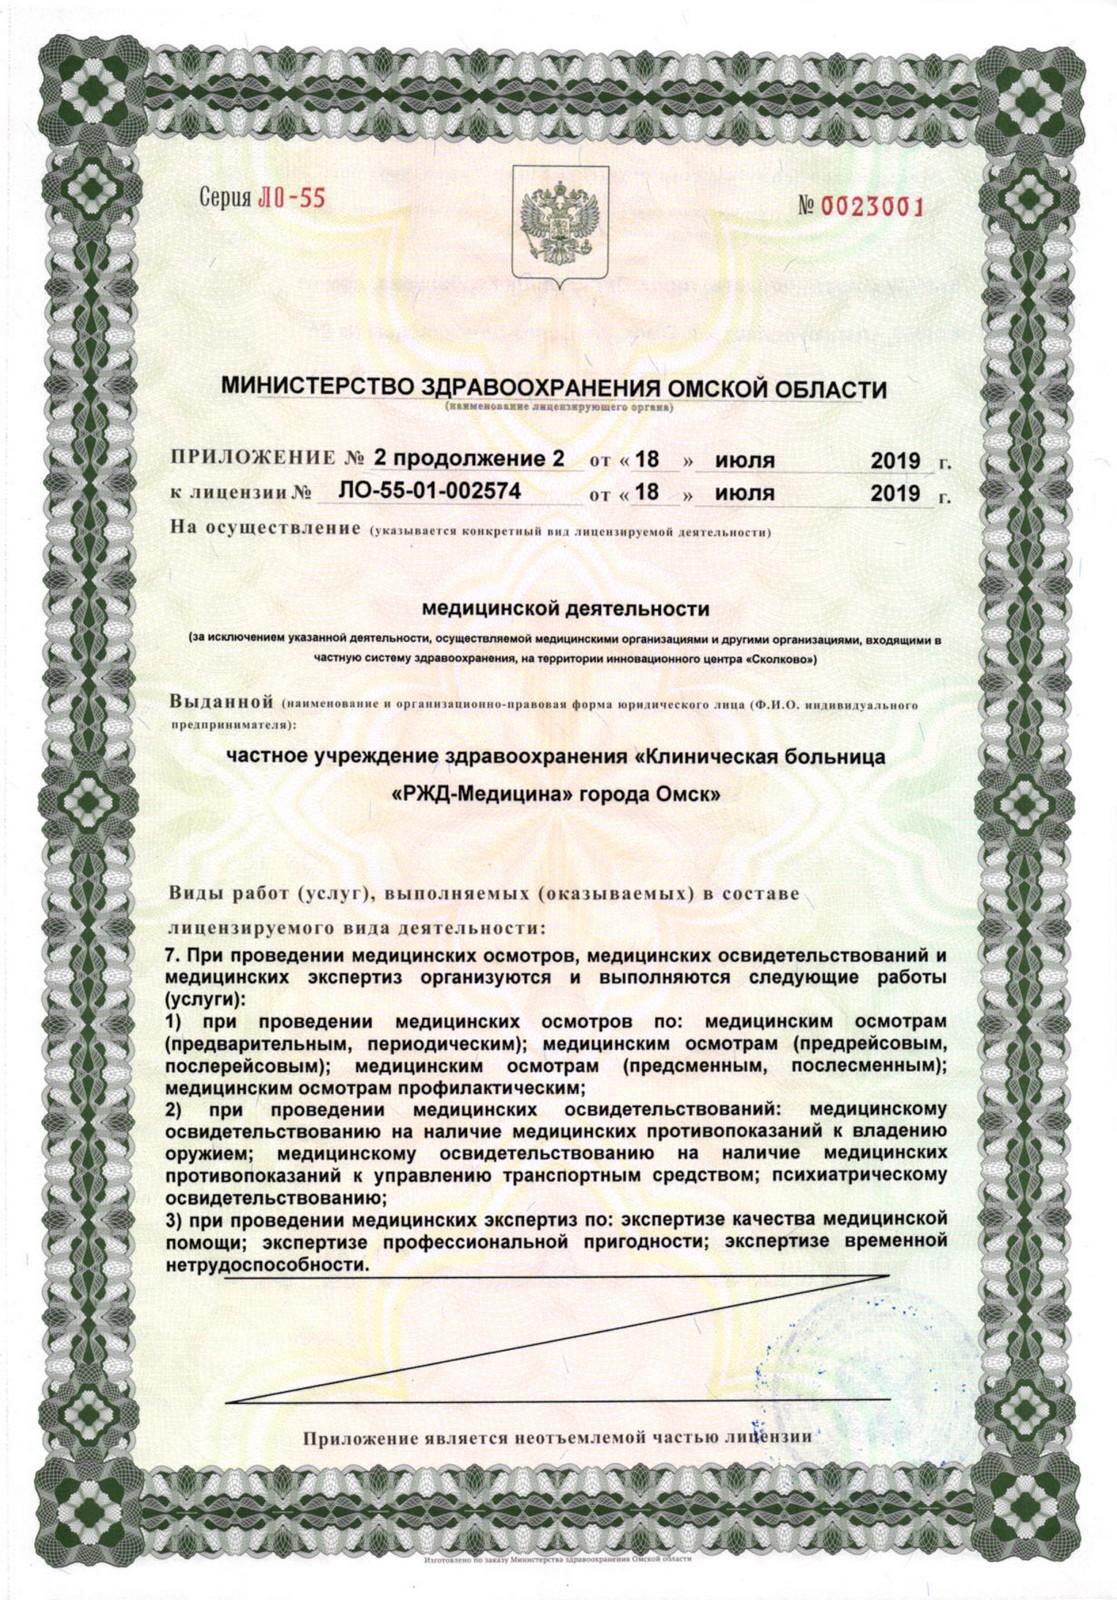 License-2019-07-18_25